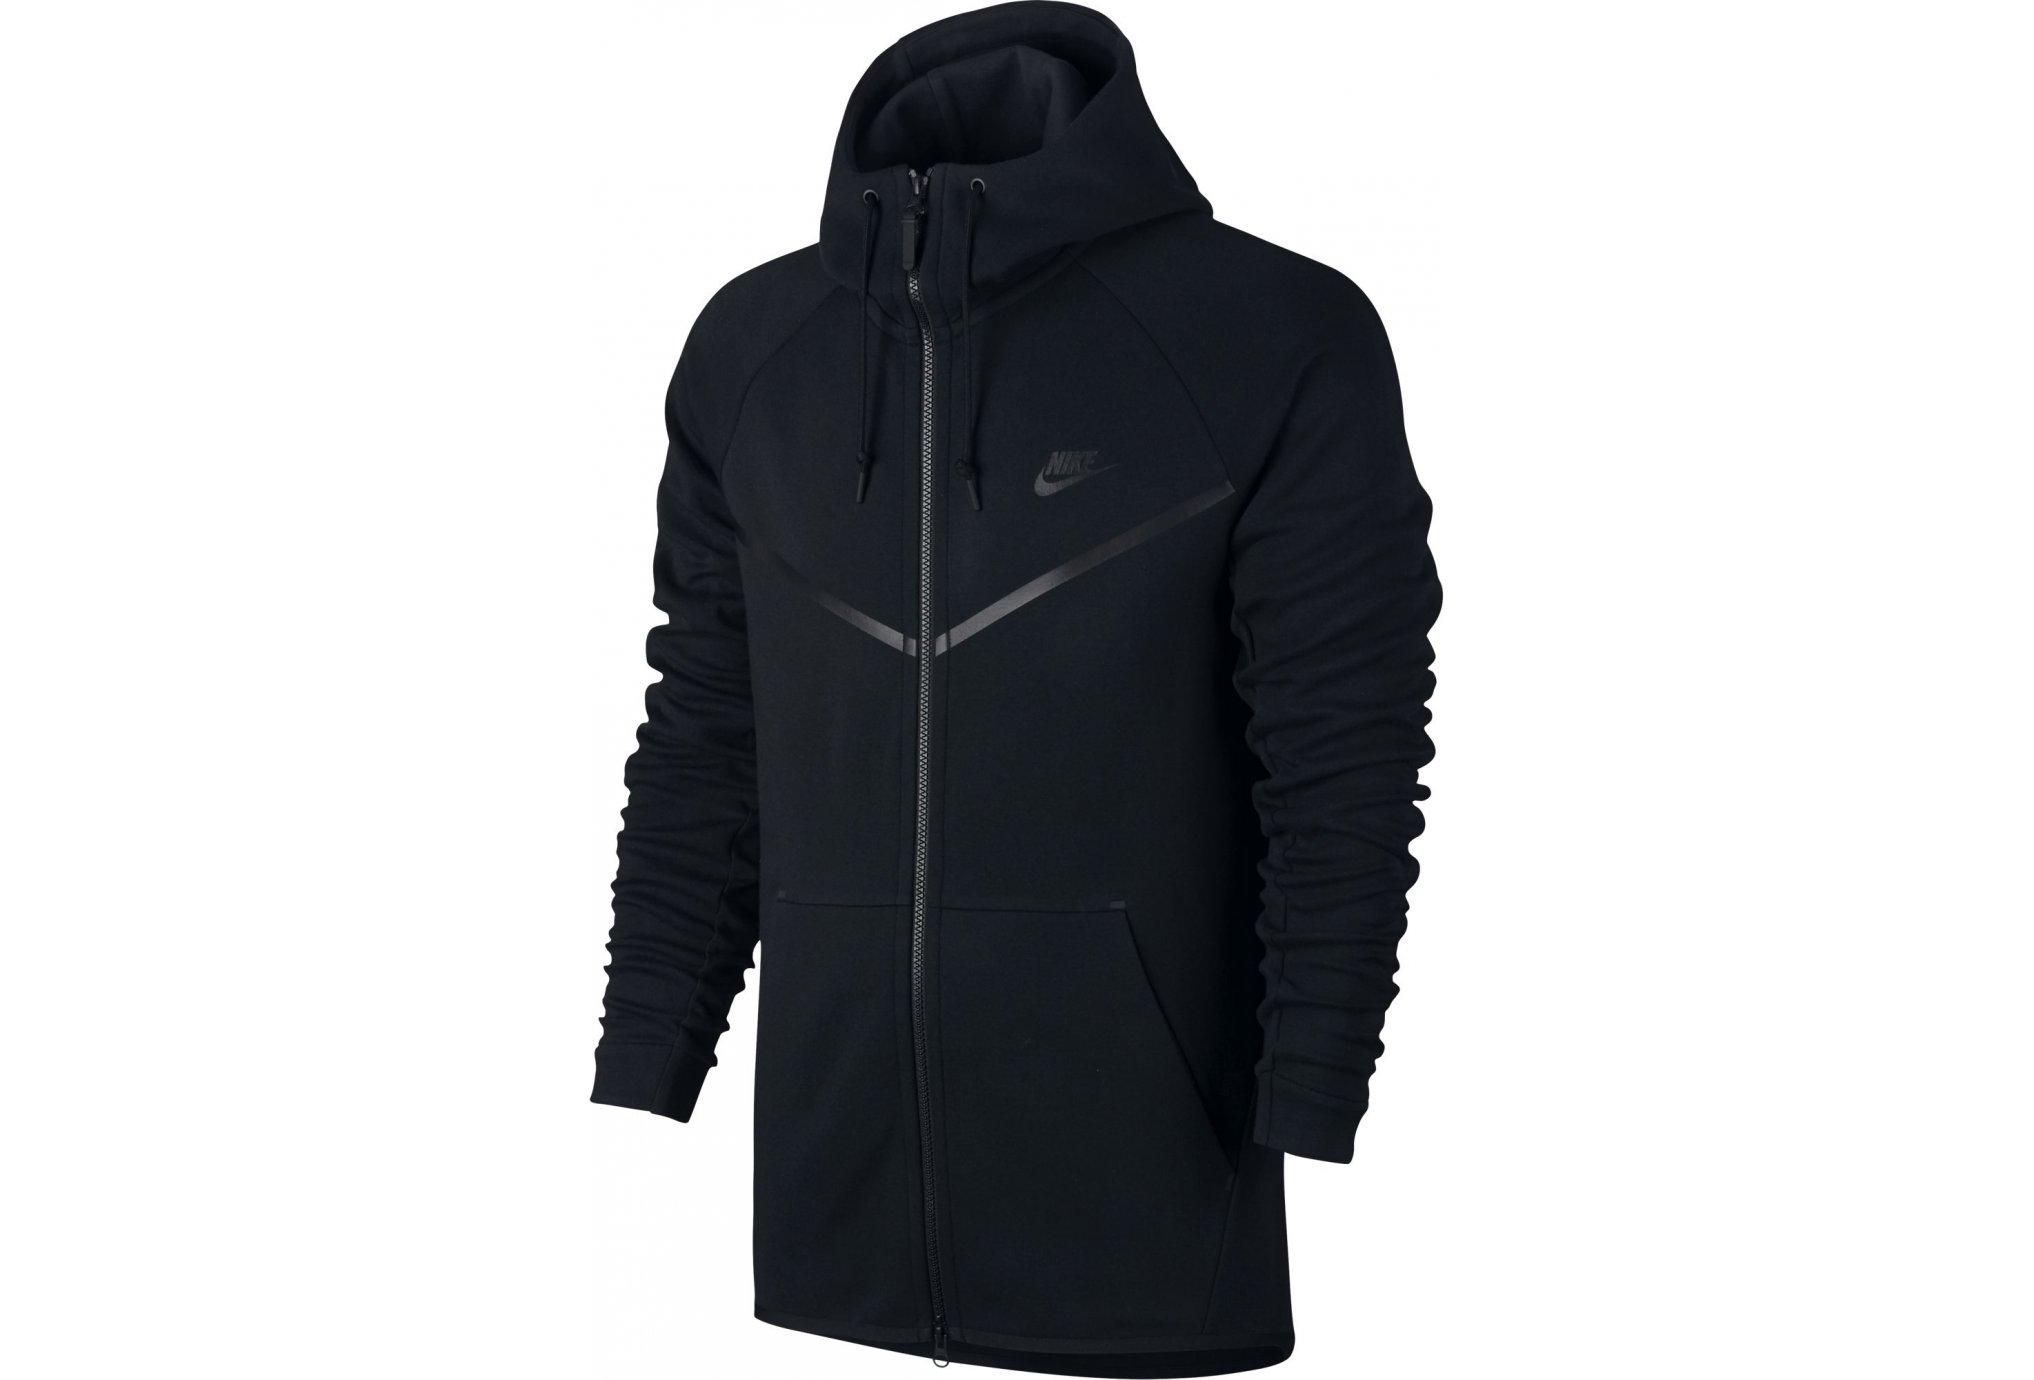 Nike Tech Fleece Windrunner M Vêtements running homme